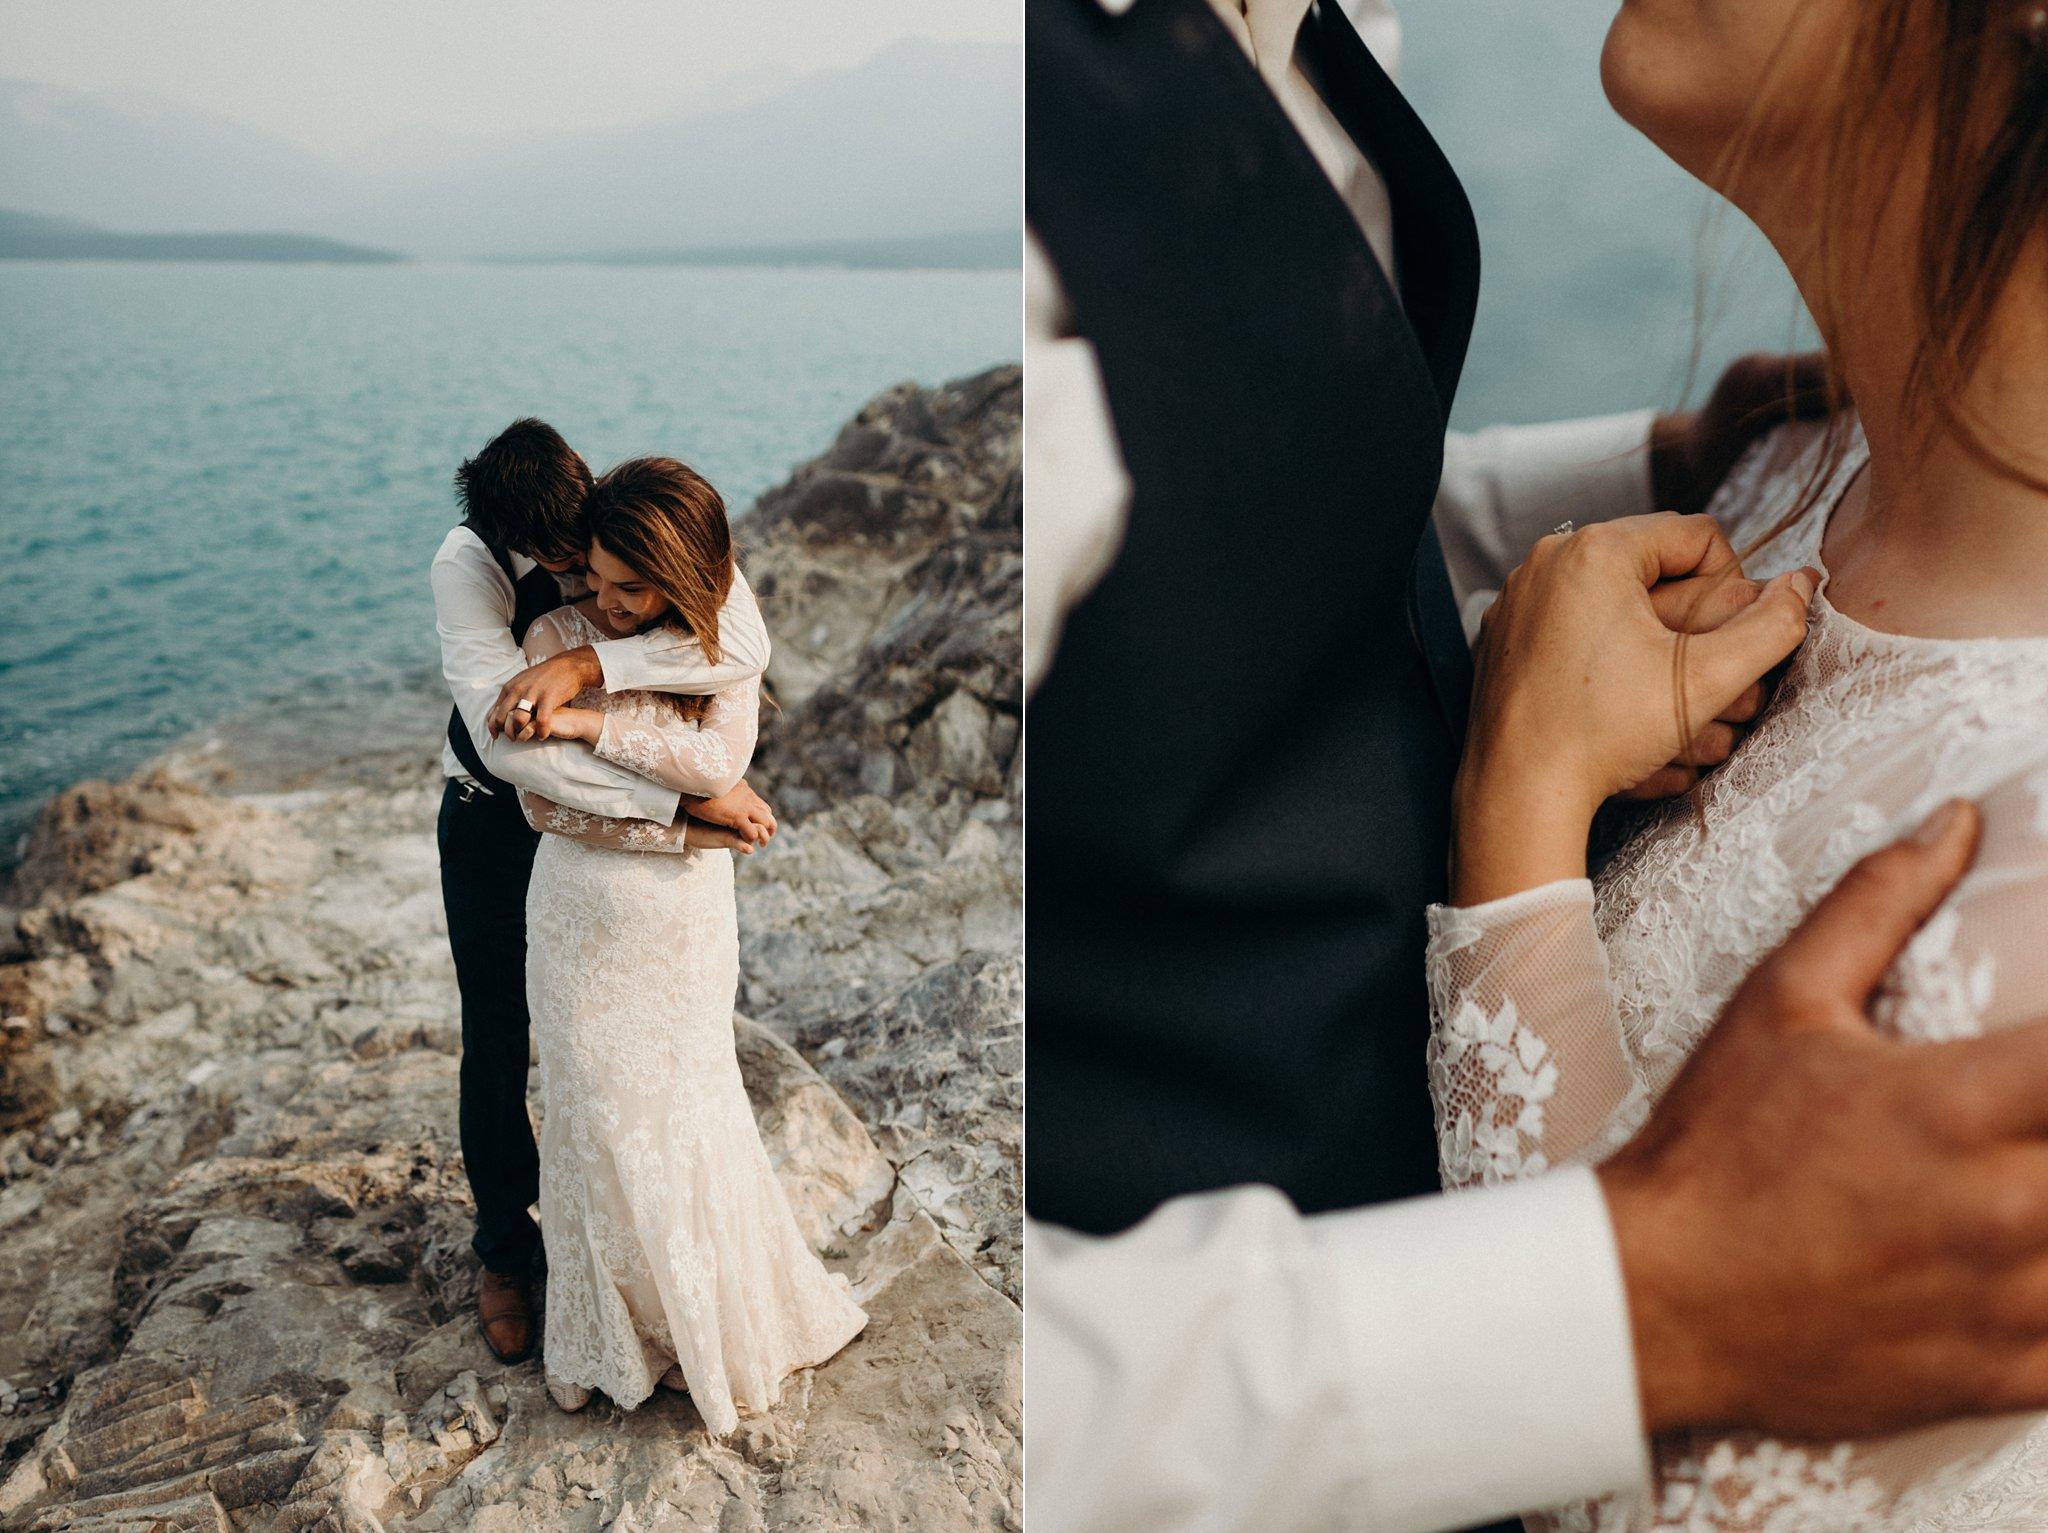 kaihla_tonai_intimate_wedding_elopement_photographer_6749.jpg